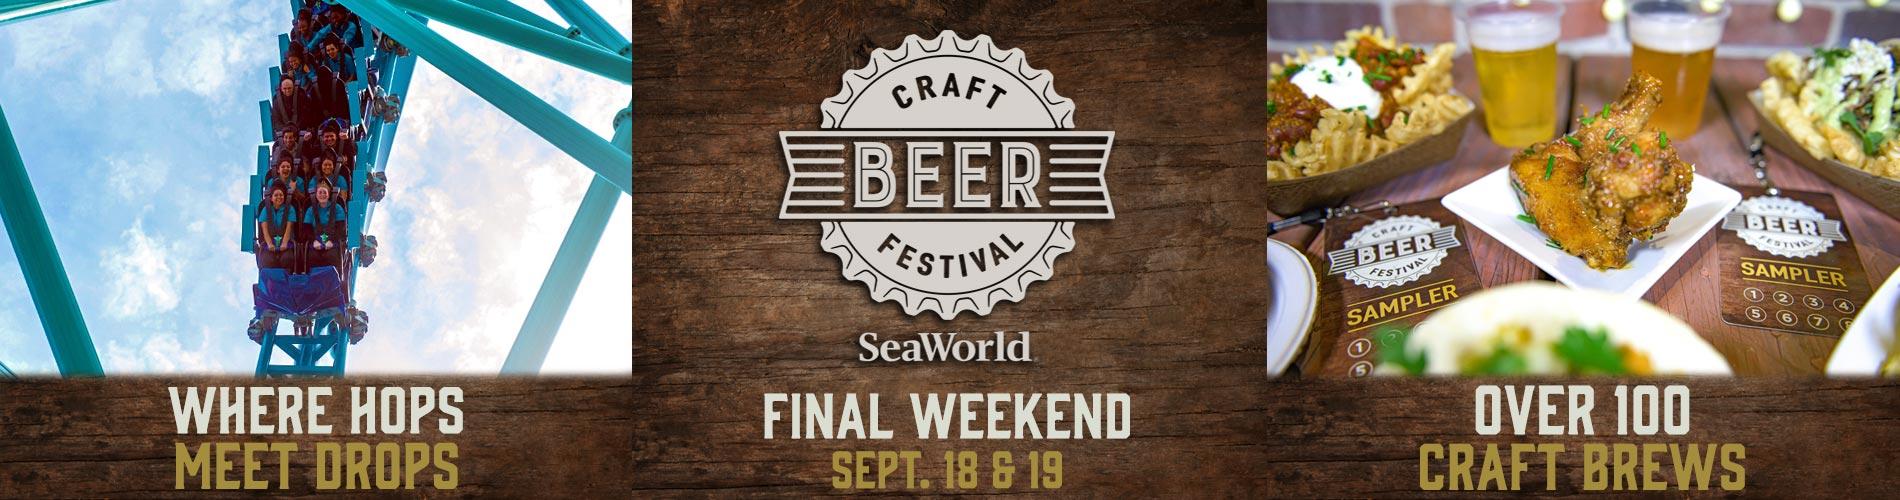 Final Weekend of the SeaWorld San Diego Craft Beer Festival